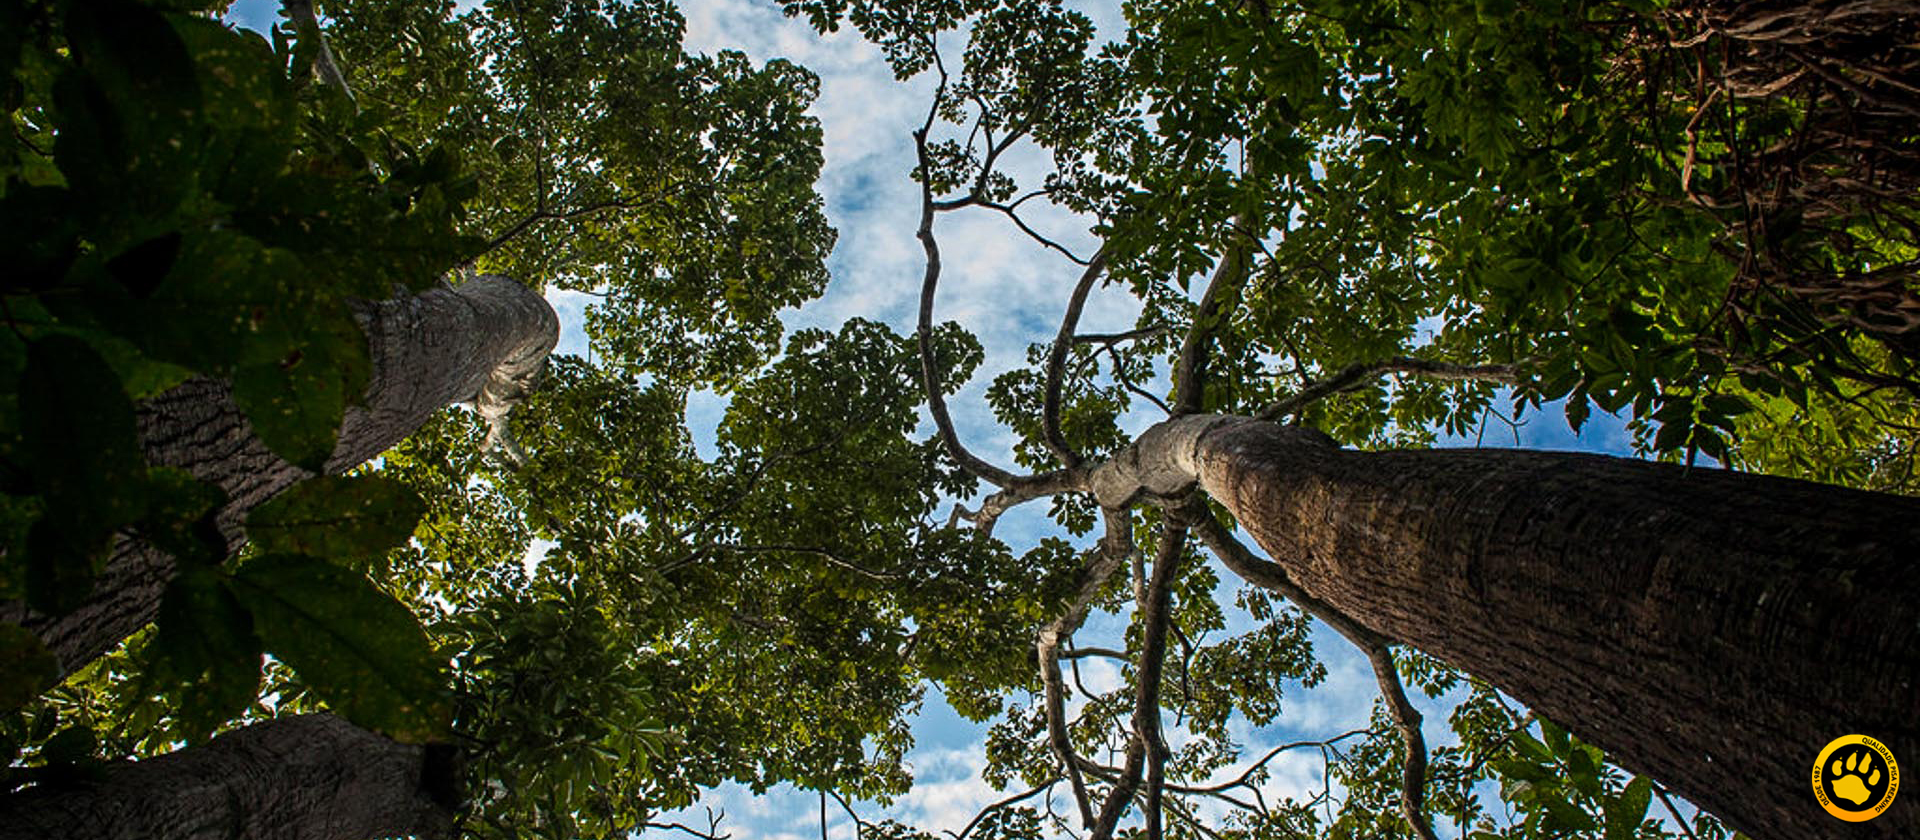 Desafios na Reserva Mamirauá: como ajudar